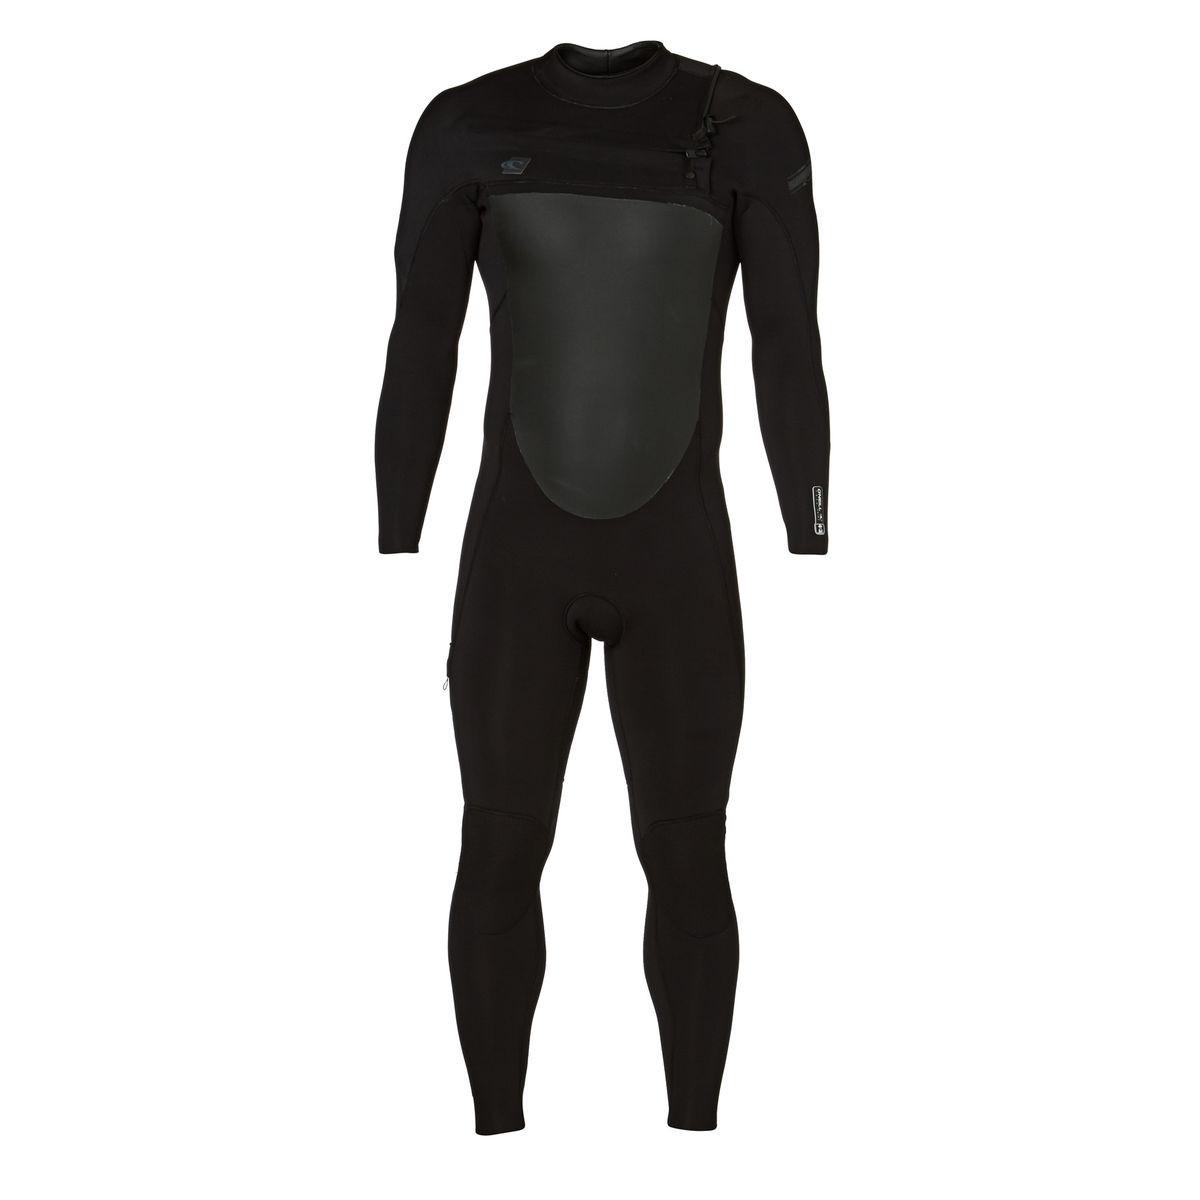 O'Neill Superfreak 4/3mm 2017 Chest Zip Wetsuit - Black/ Black/ Black